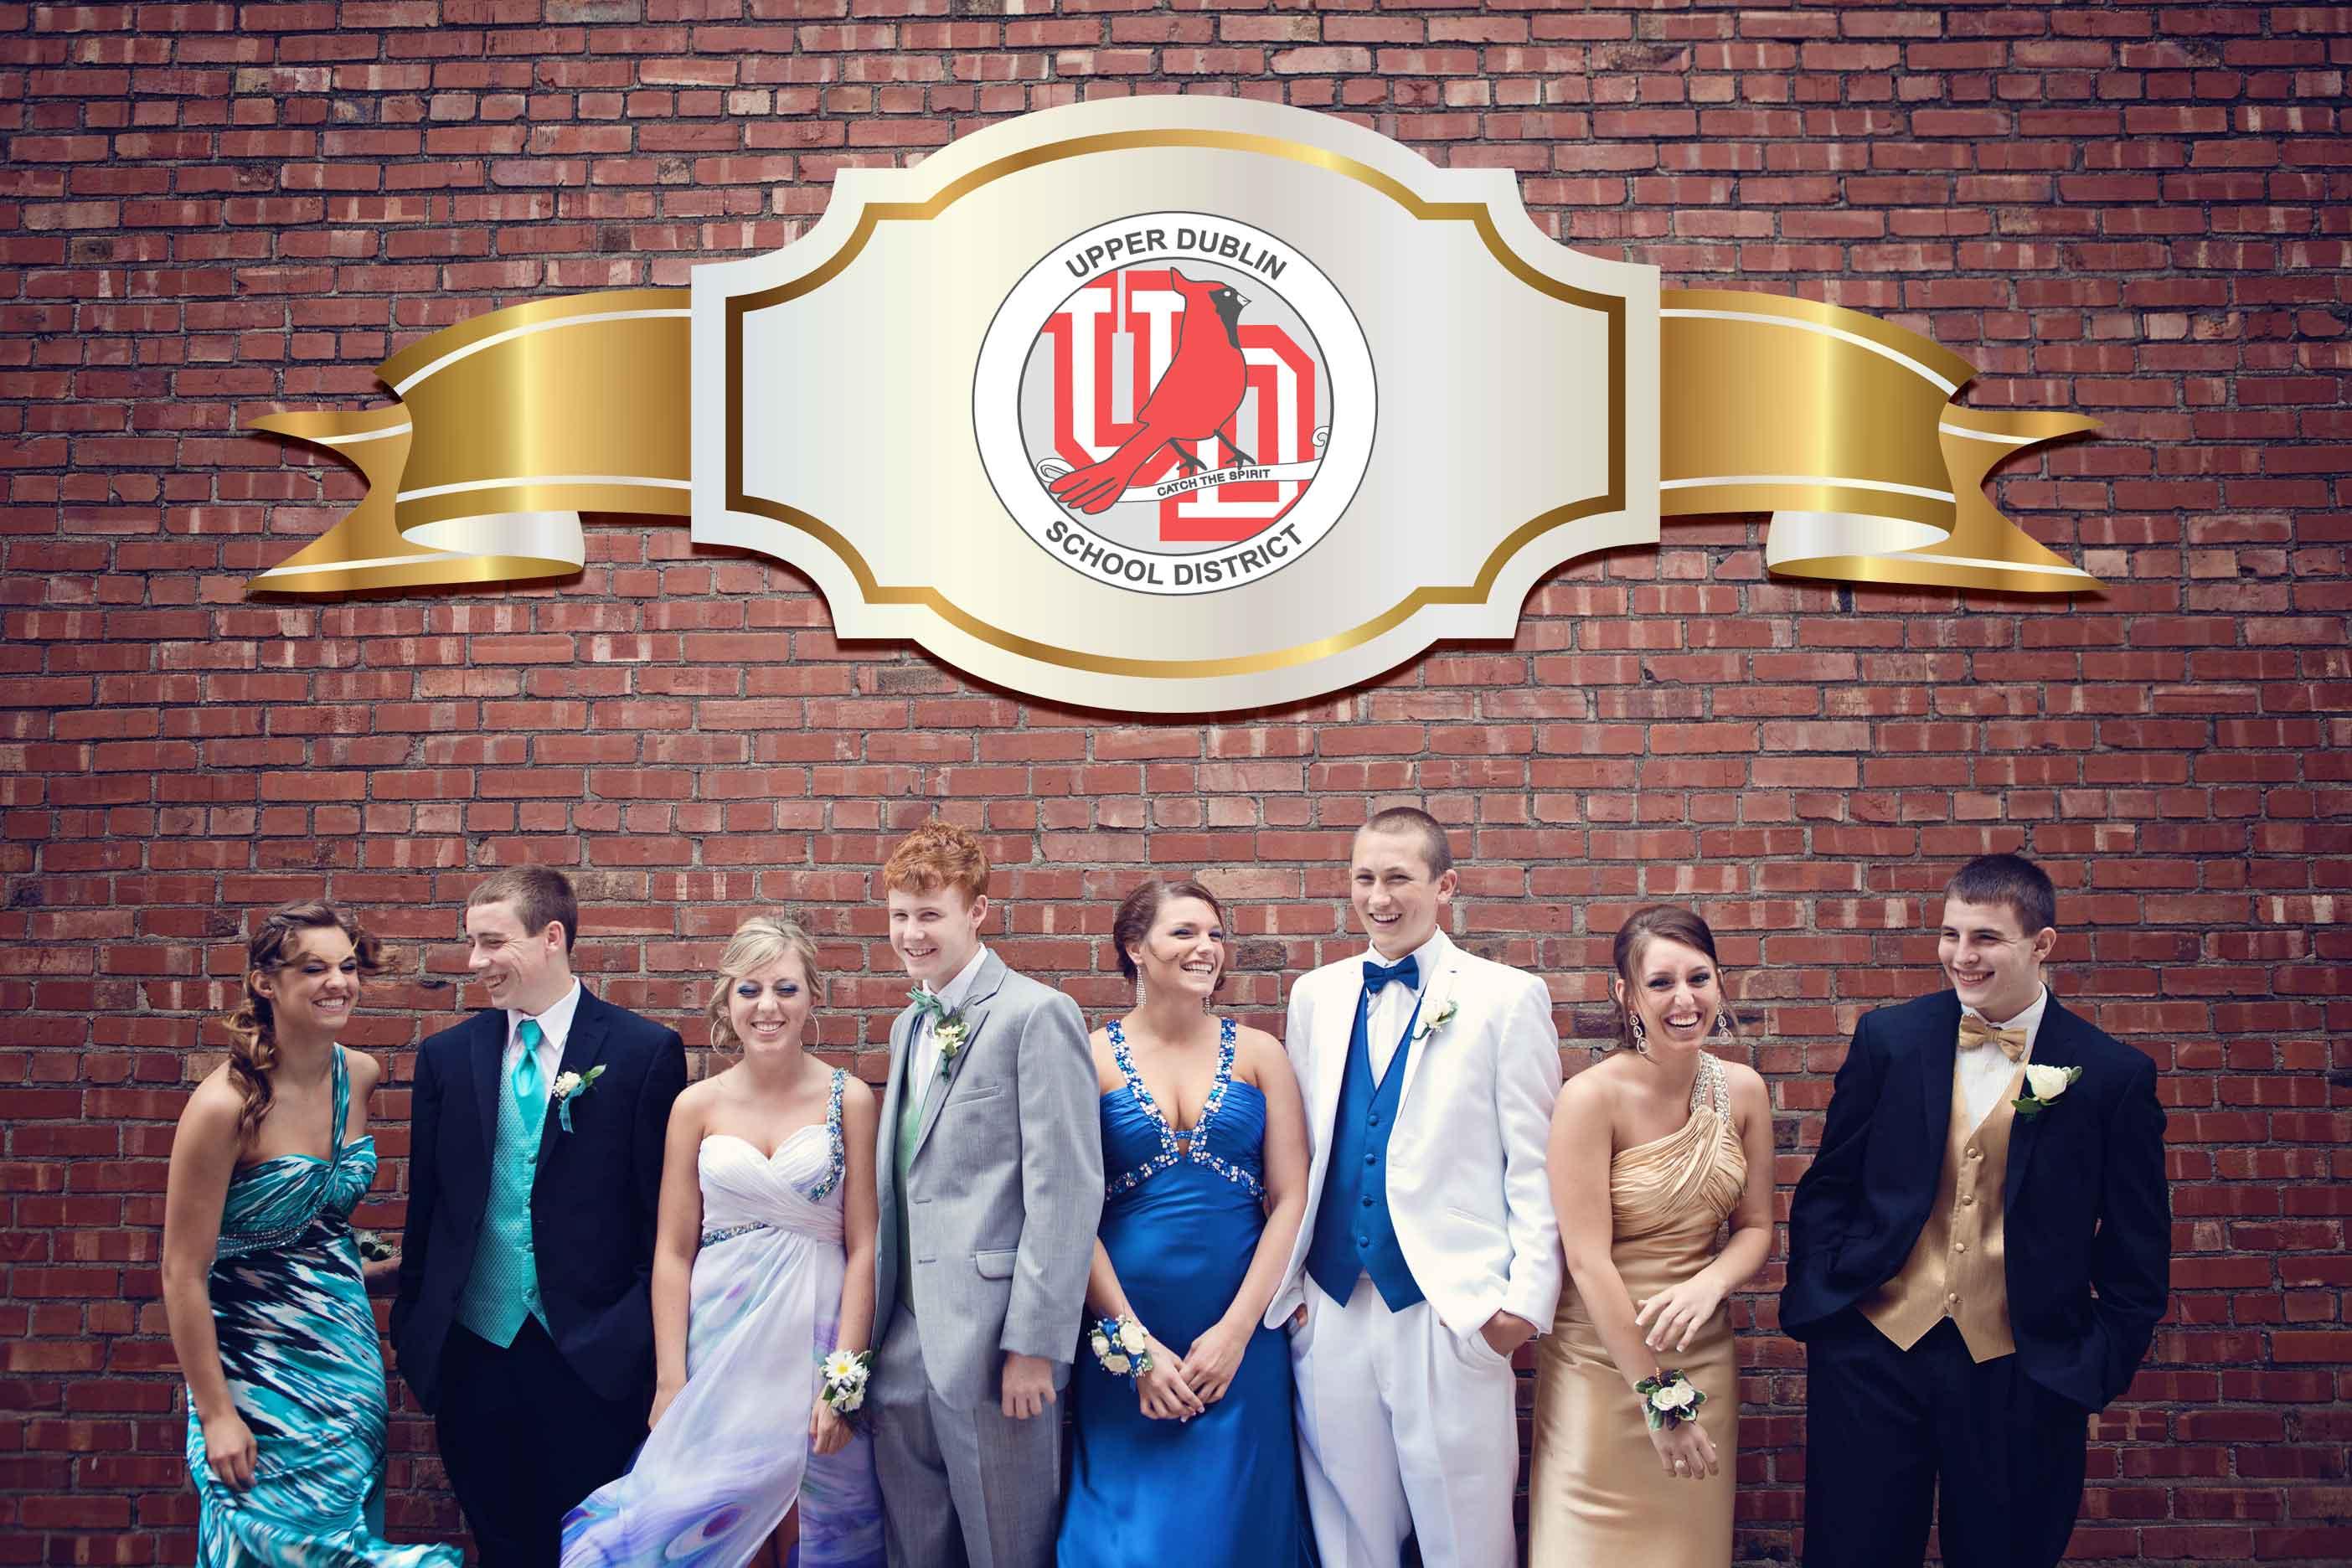 upper dublin high school prom